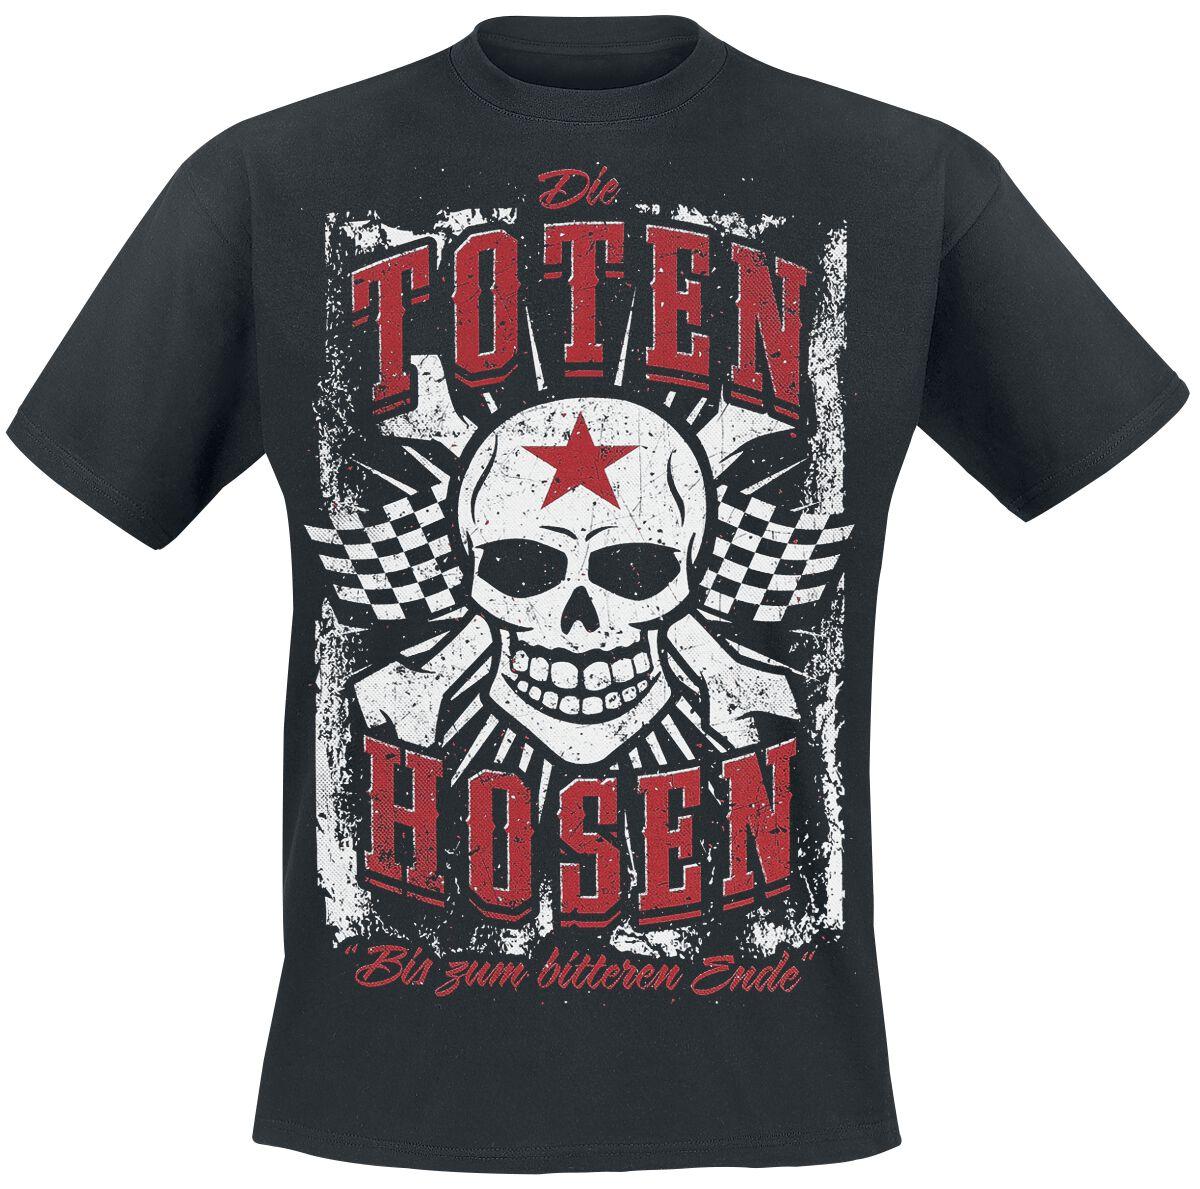 Zespoły - Koszulki - T-Shirt Die Toten Hosen Vintage Skull T-Shirt czarny - 355106